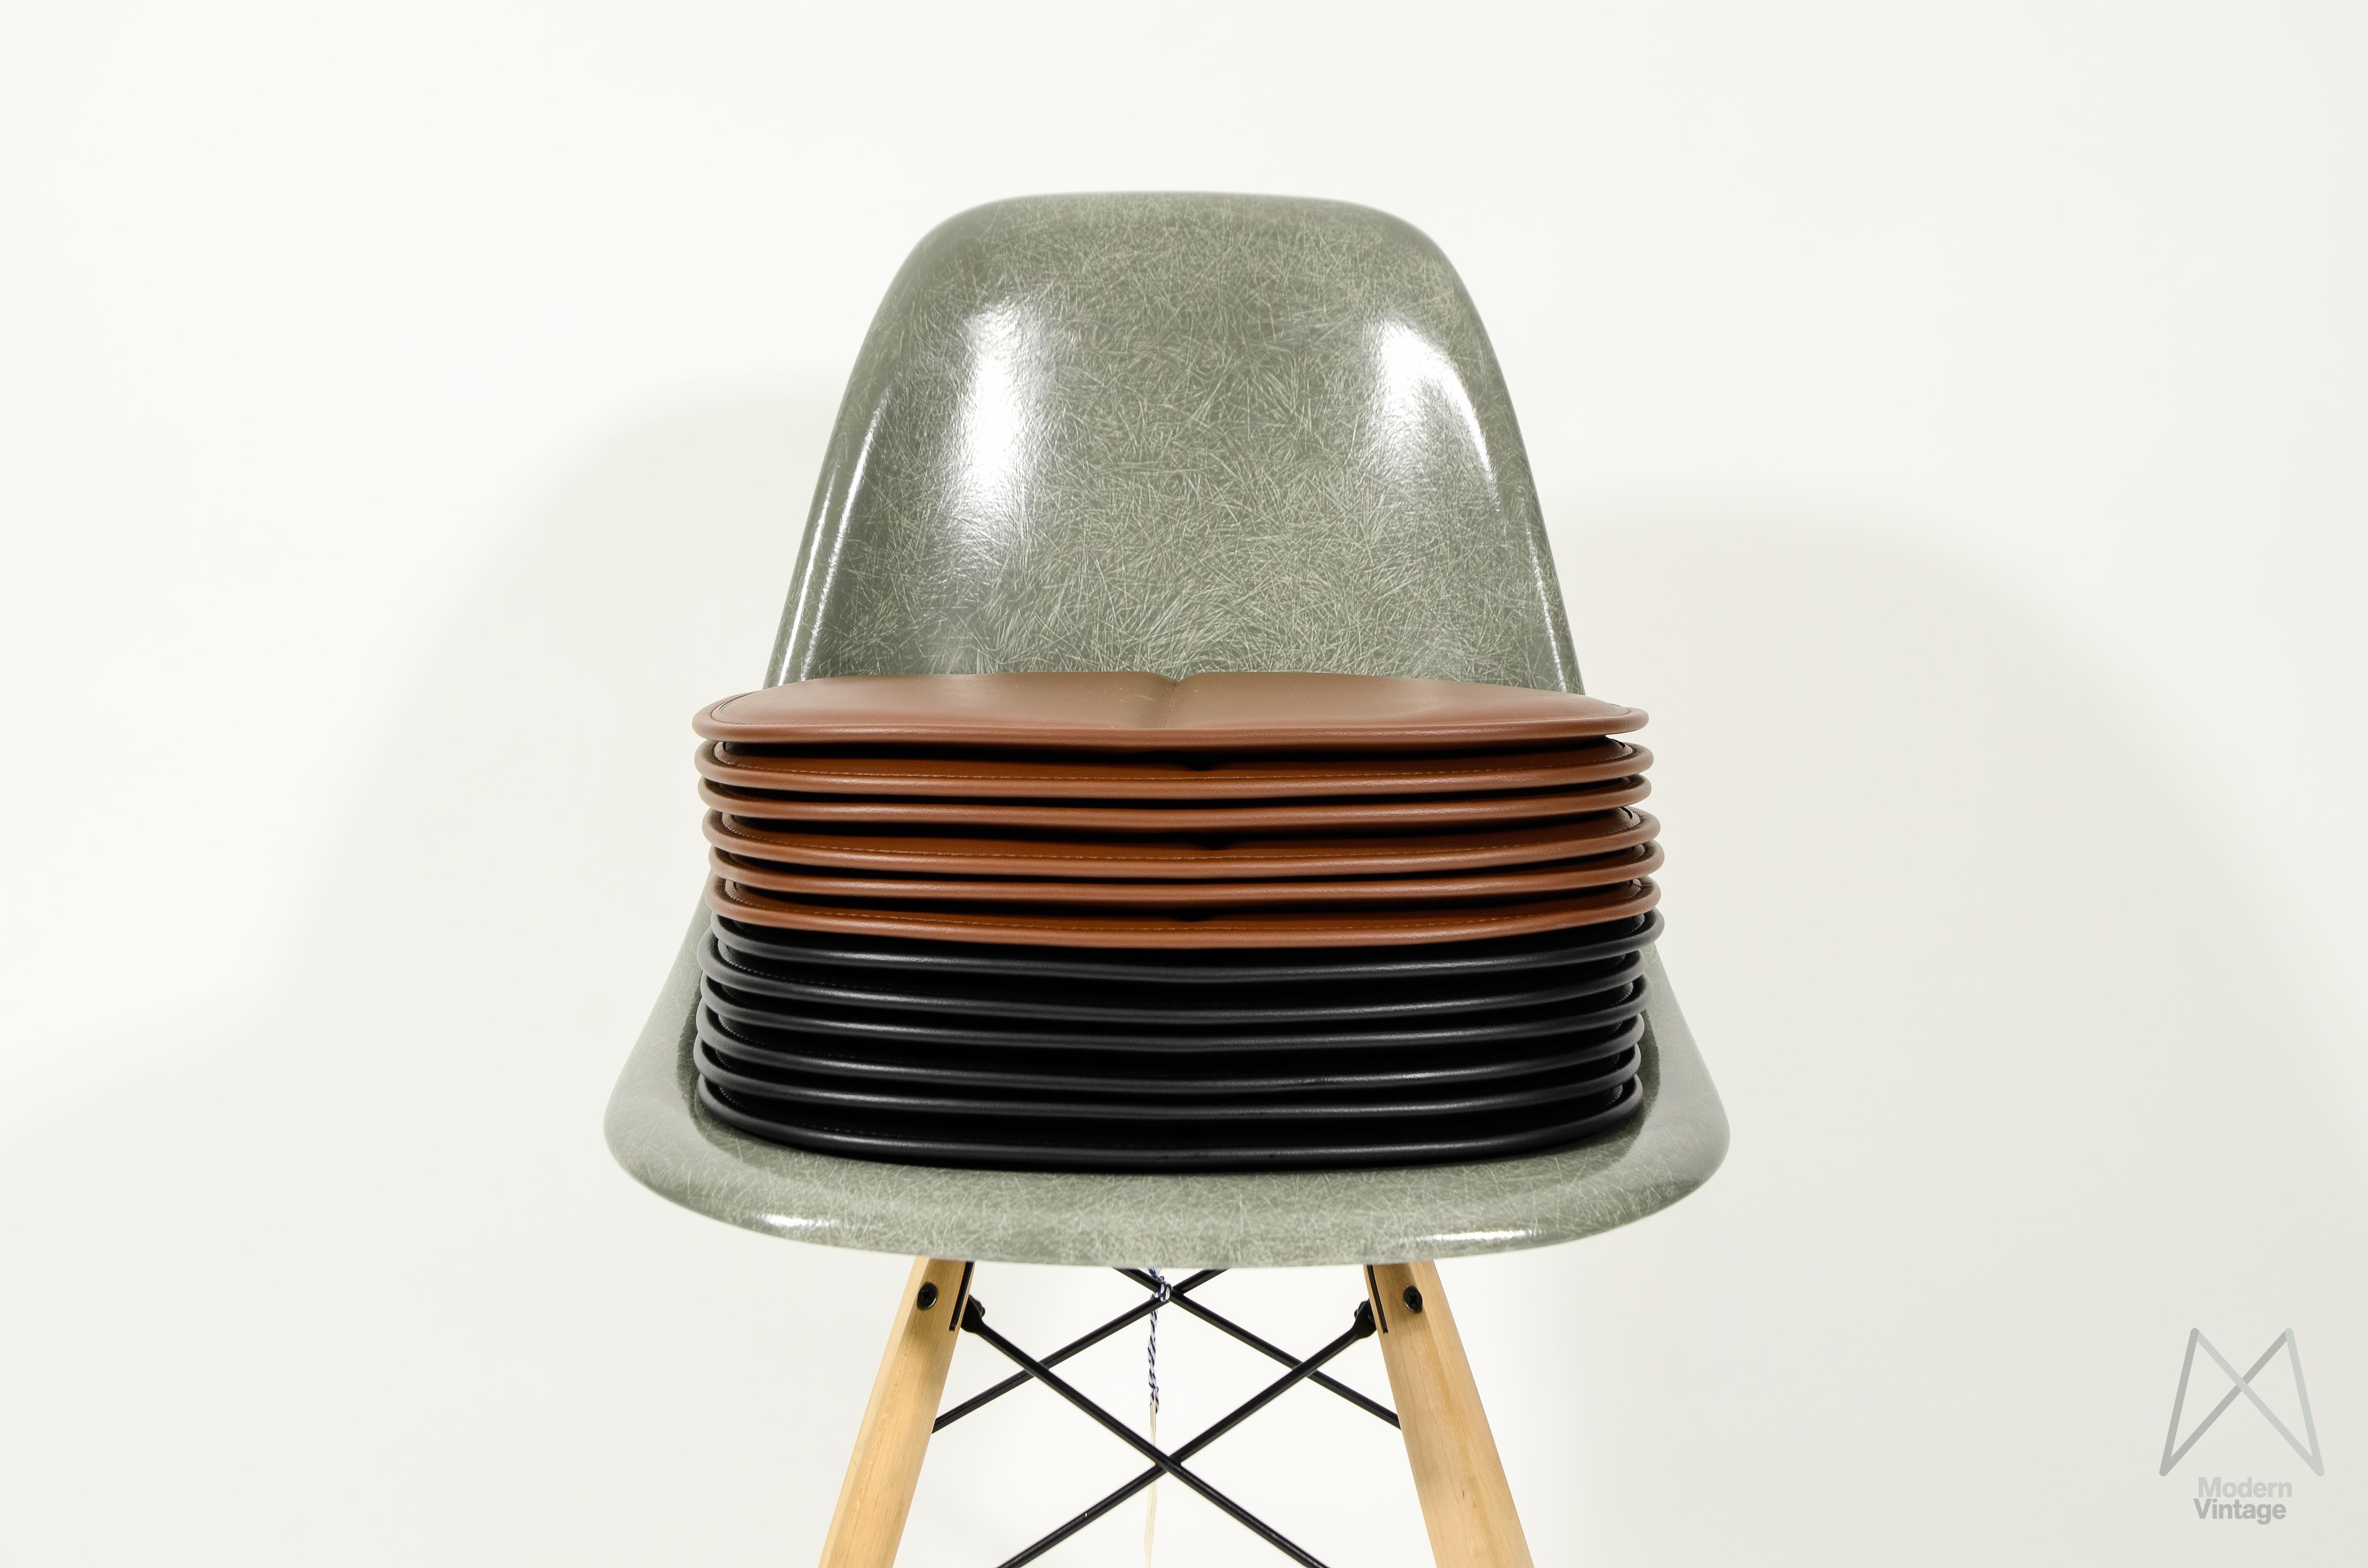 eames fiberglass chair swing cane modern vintage amsterdam original furniture